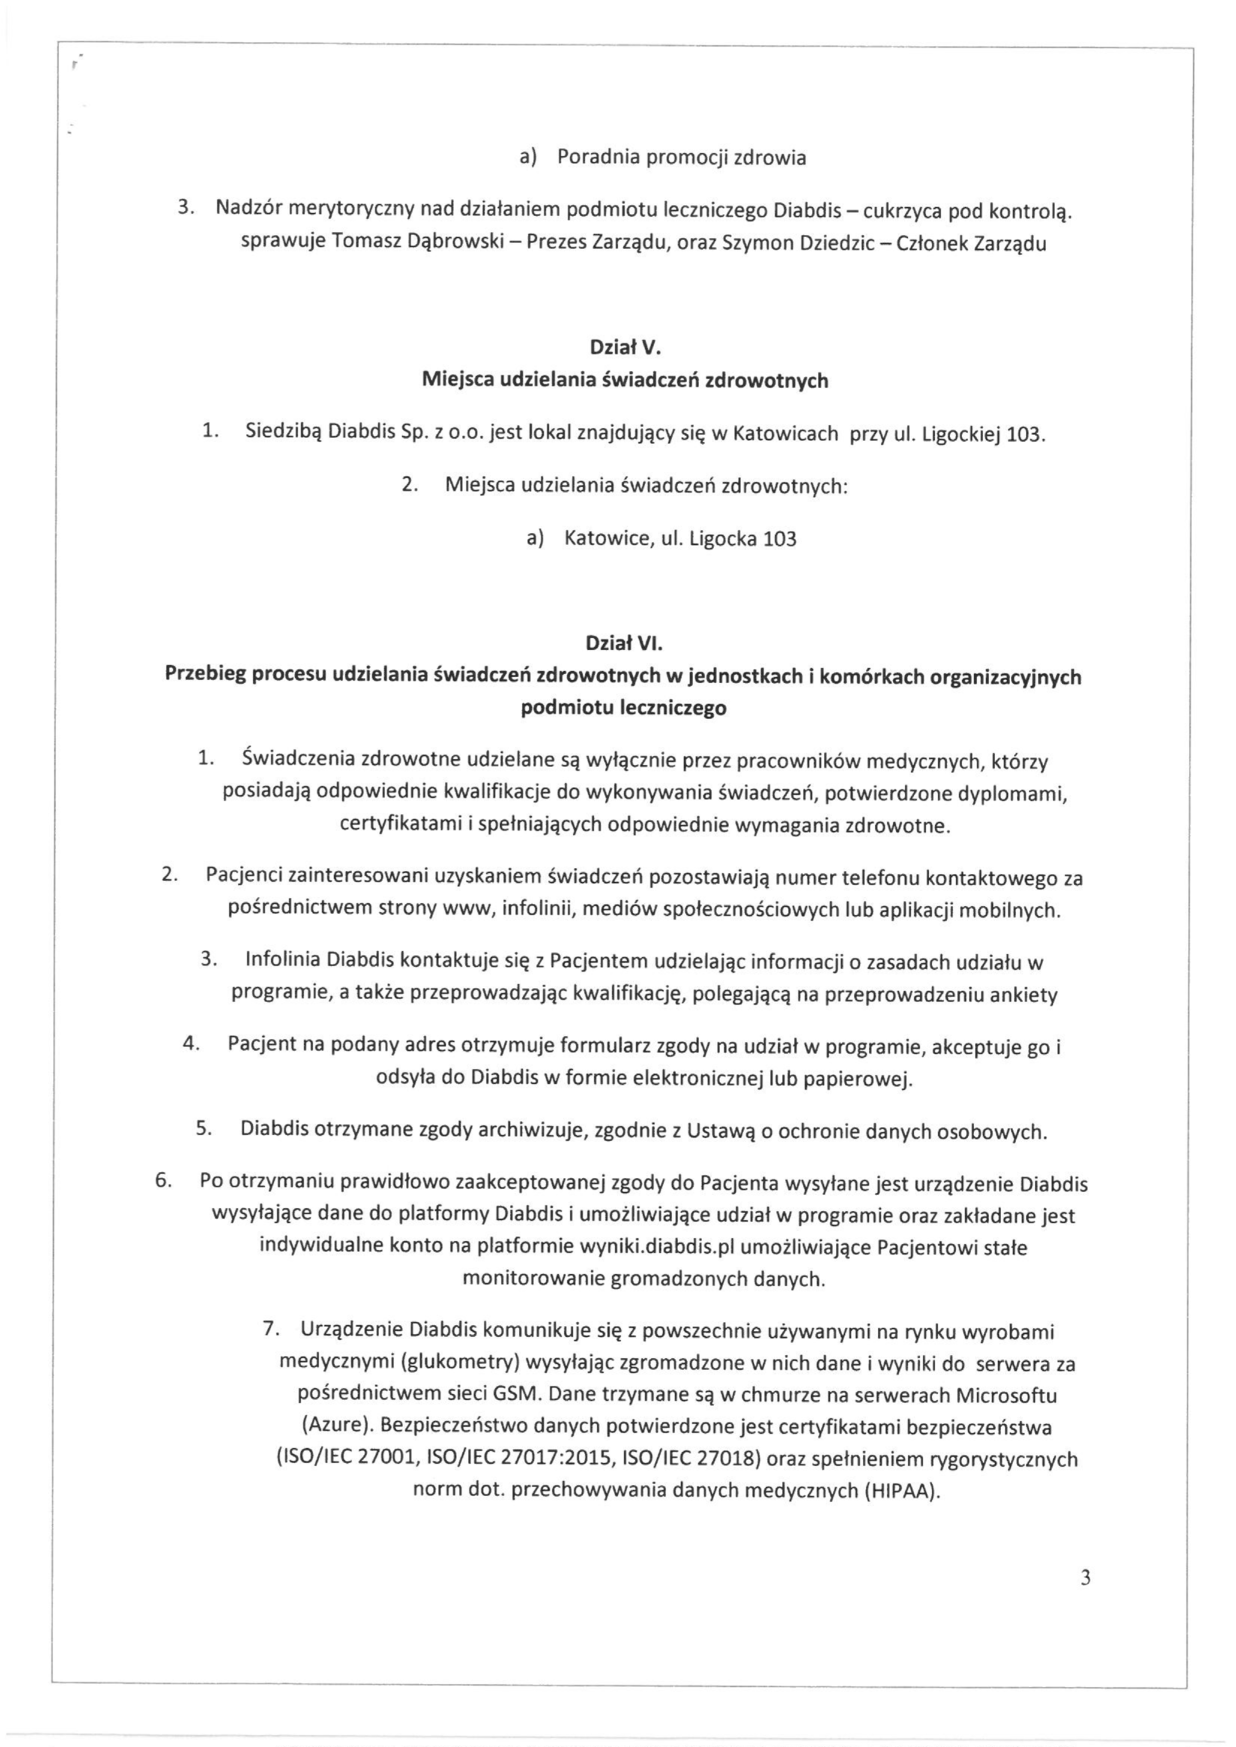 Regulamin organizacyjny, strona 3